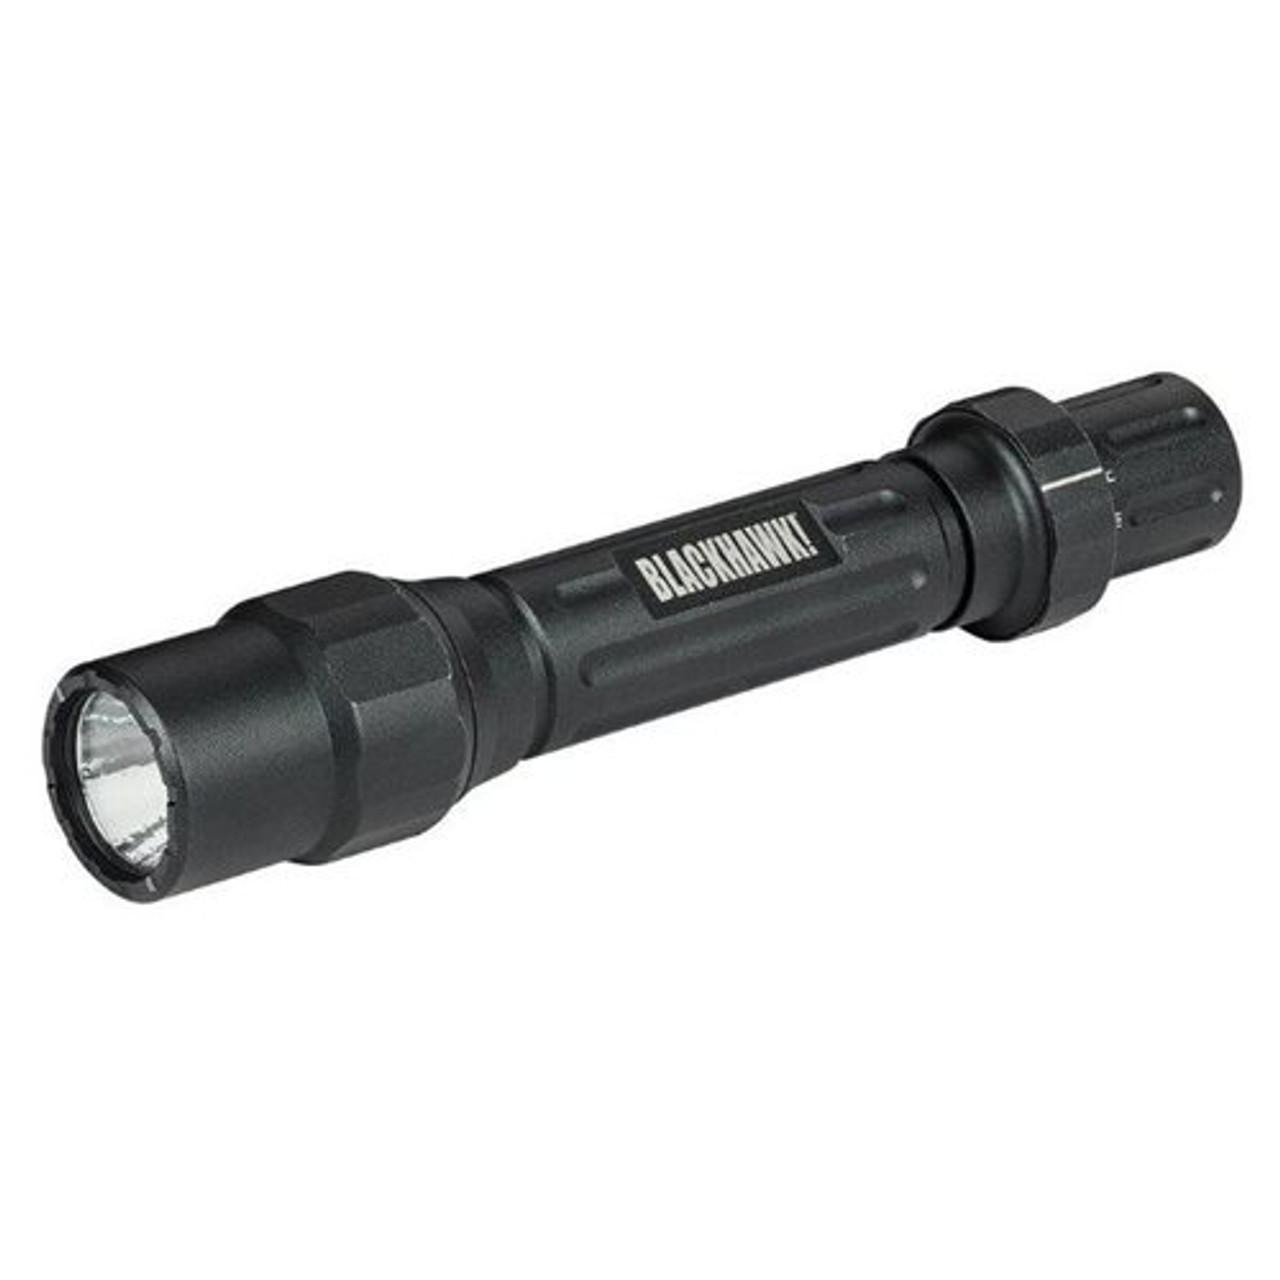 Blackhawk! 75FL026BK Night-Ops® Legacy Tactical Handheld Flashlight L-A2, Aluminum Body, High-Output CREE® XP-G LED Bulb